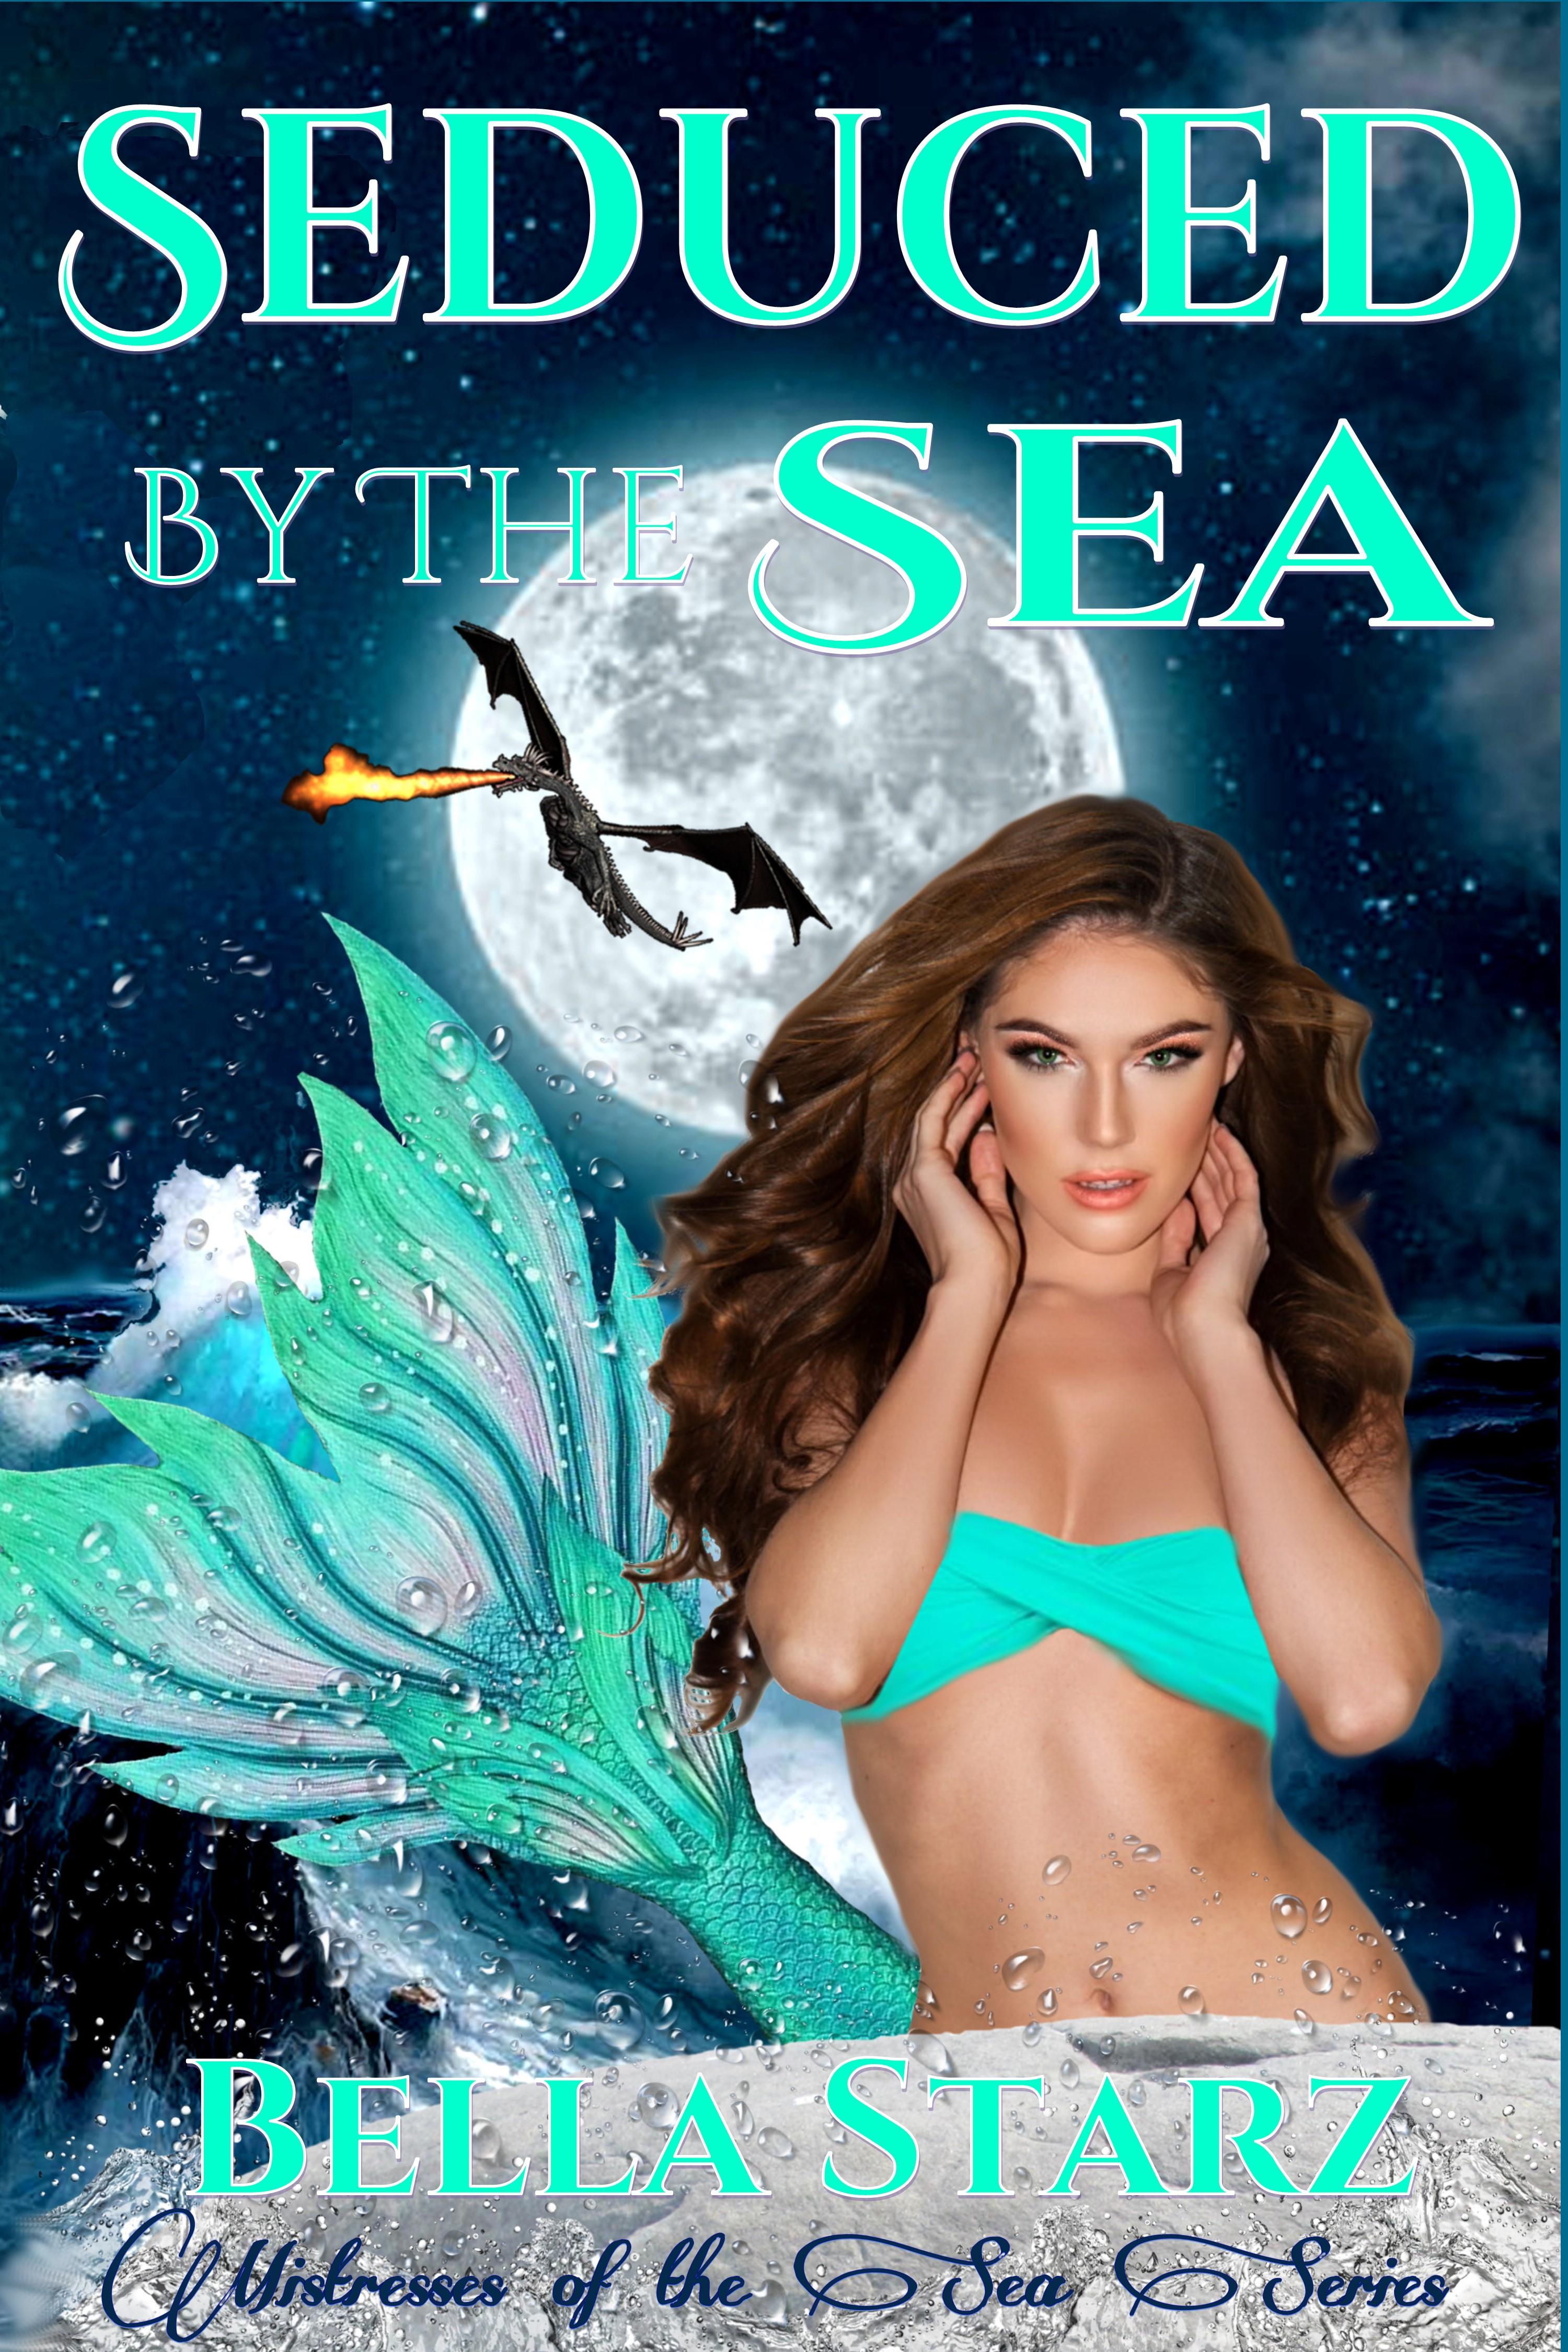 Seduced By The Sea